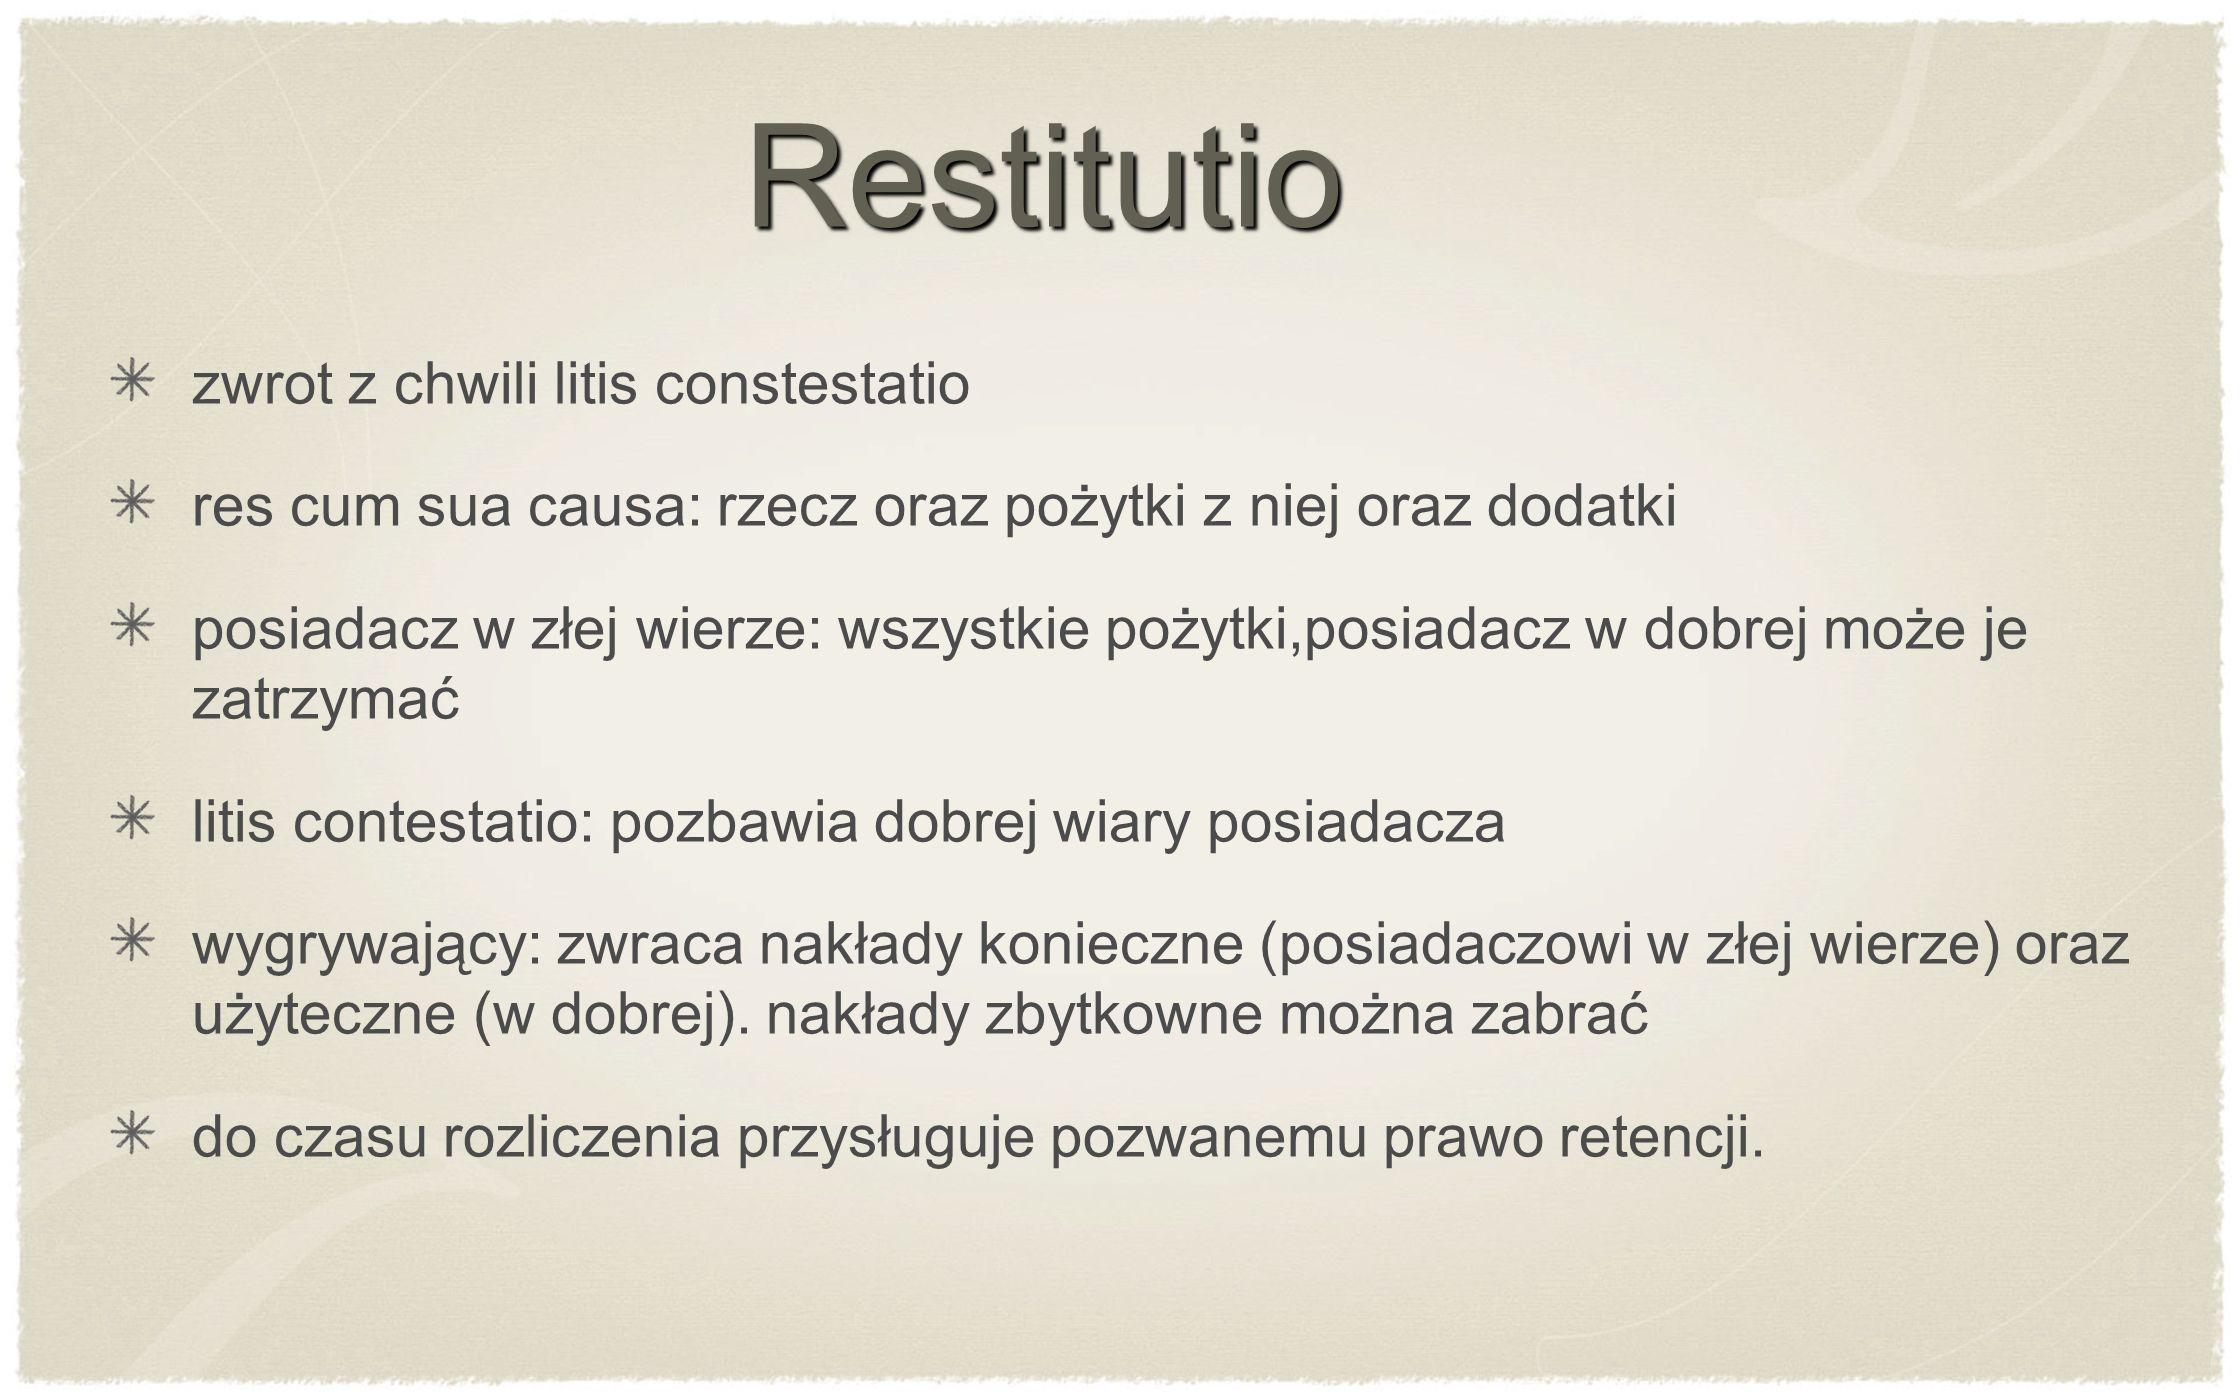 Restitutio zwrot z chwili litis constestatio